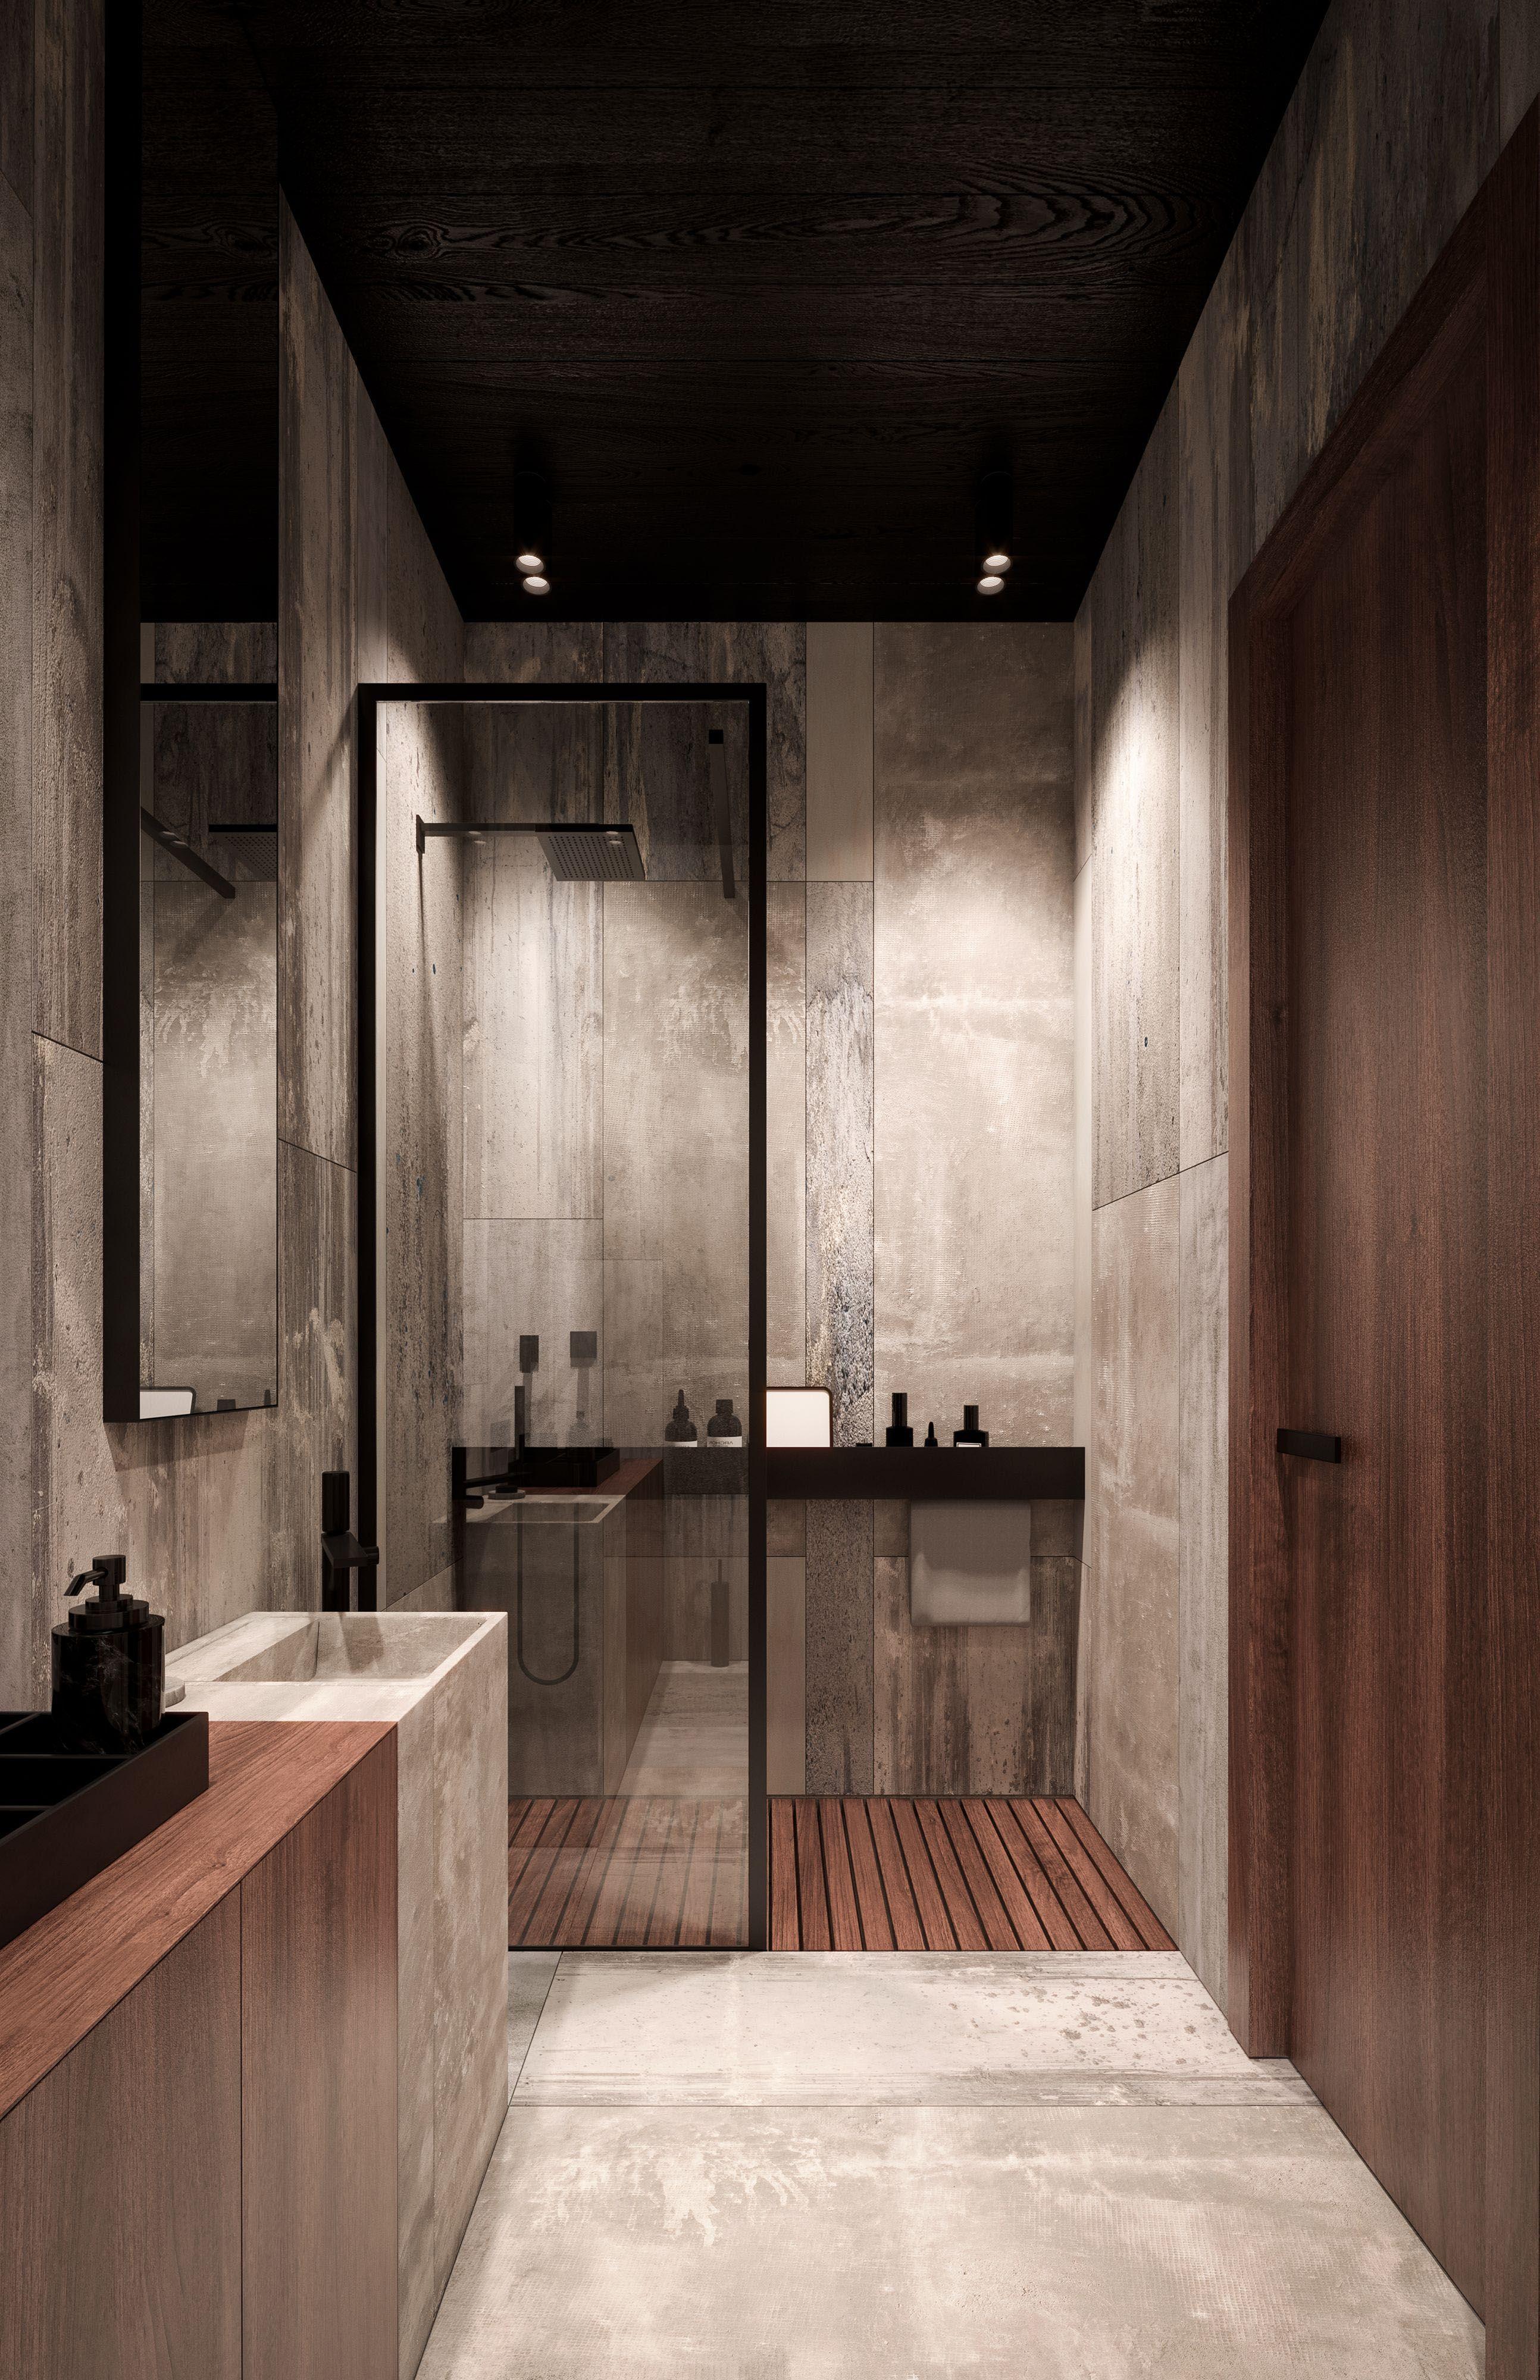 Real Home Inspiration Raised Ranch Bathroom Remodel Ideas To Inspire You Ideyi Dlya Vannoyi Kimnati Dizajn Inter Yeru Vanni Kimnati